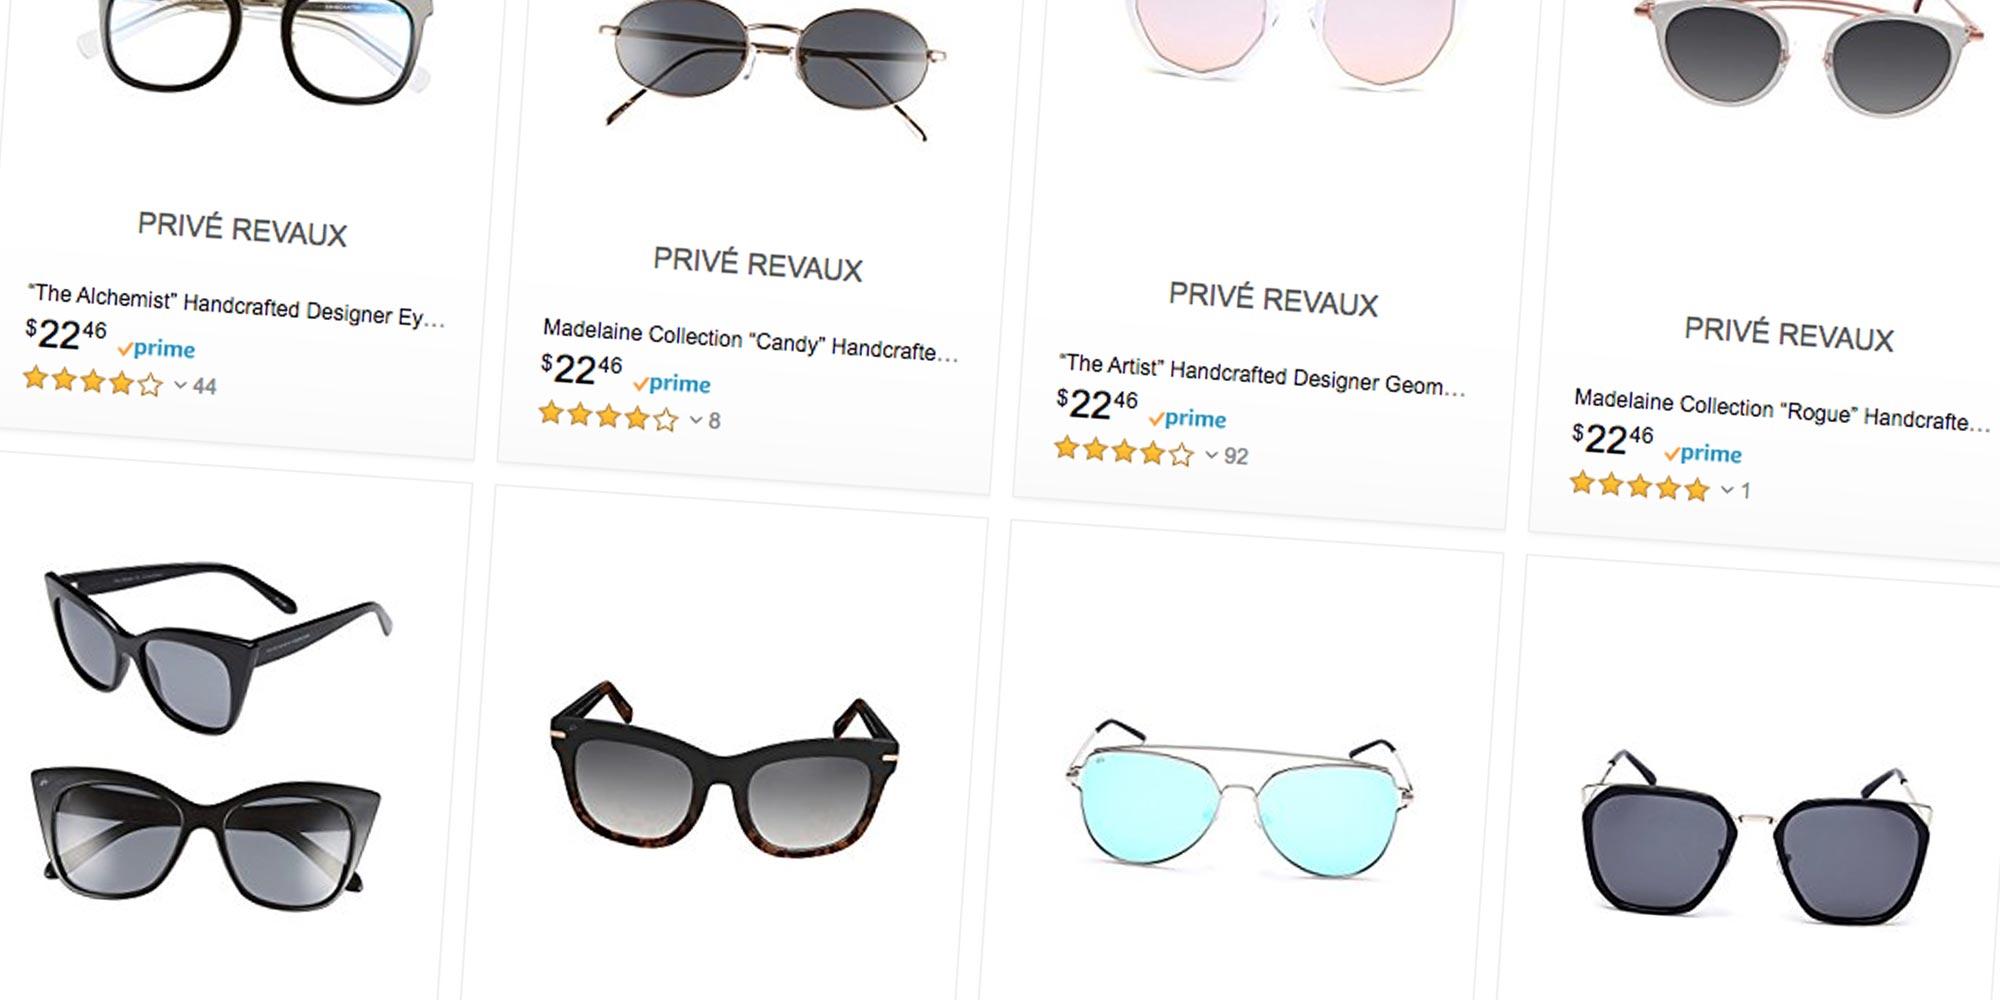 e83ca26fb7b82 Pick up sunglasses for summer fun at just  22.50 Prime shipped ...